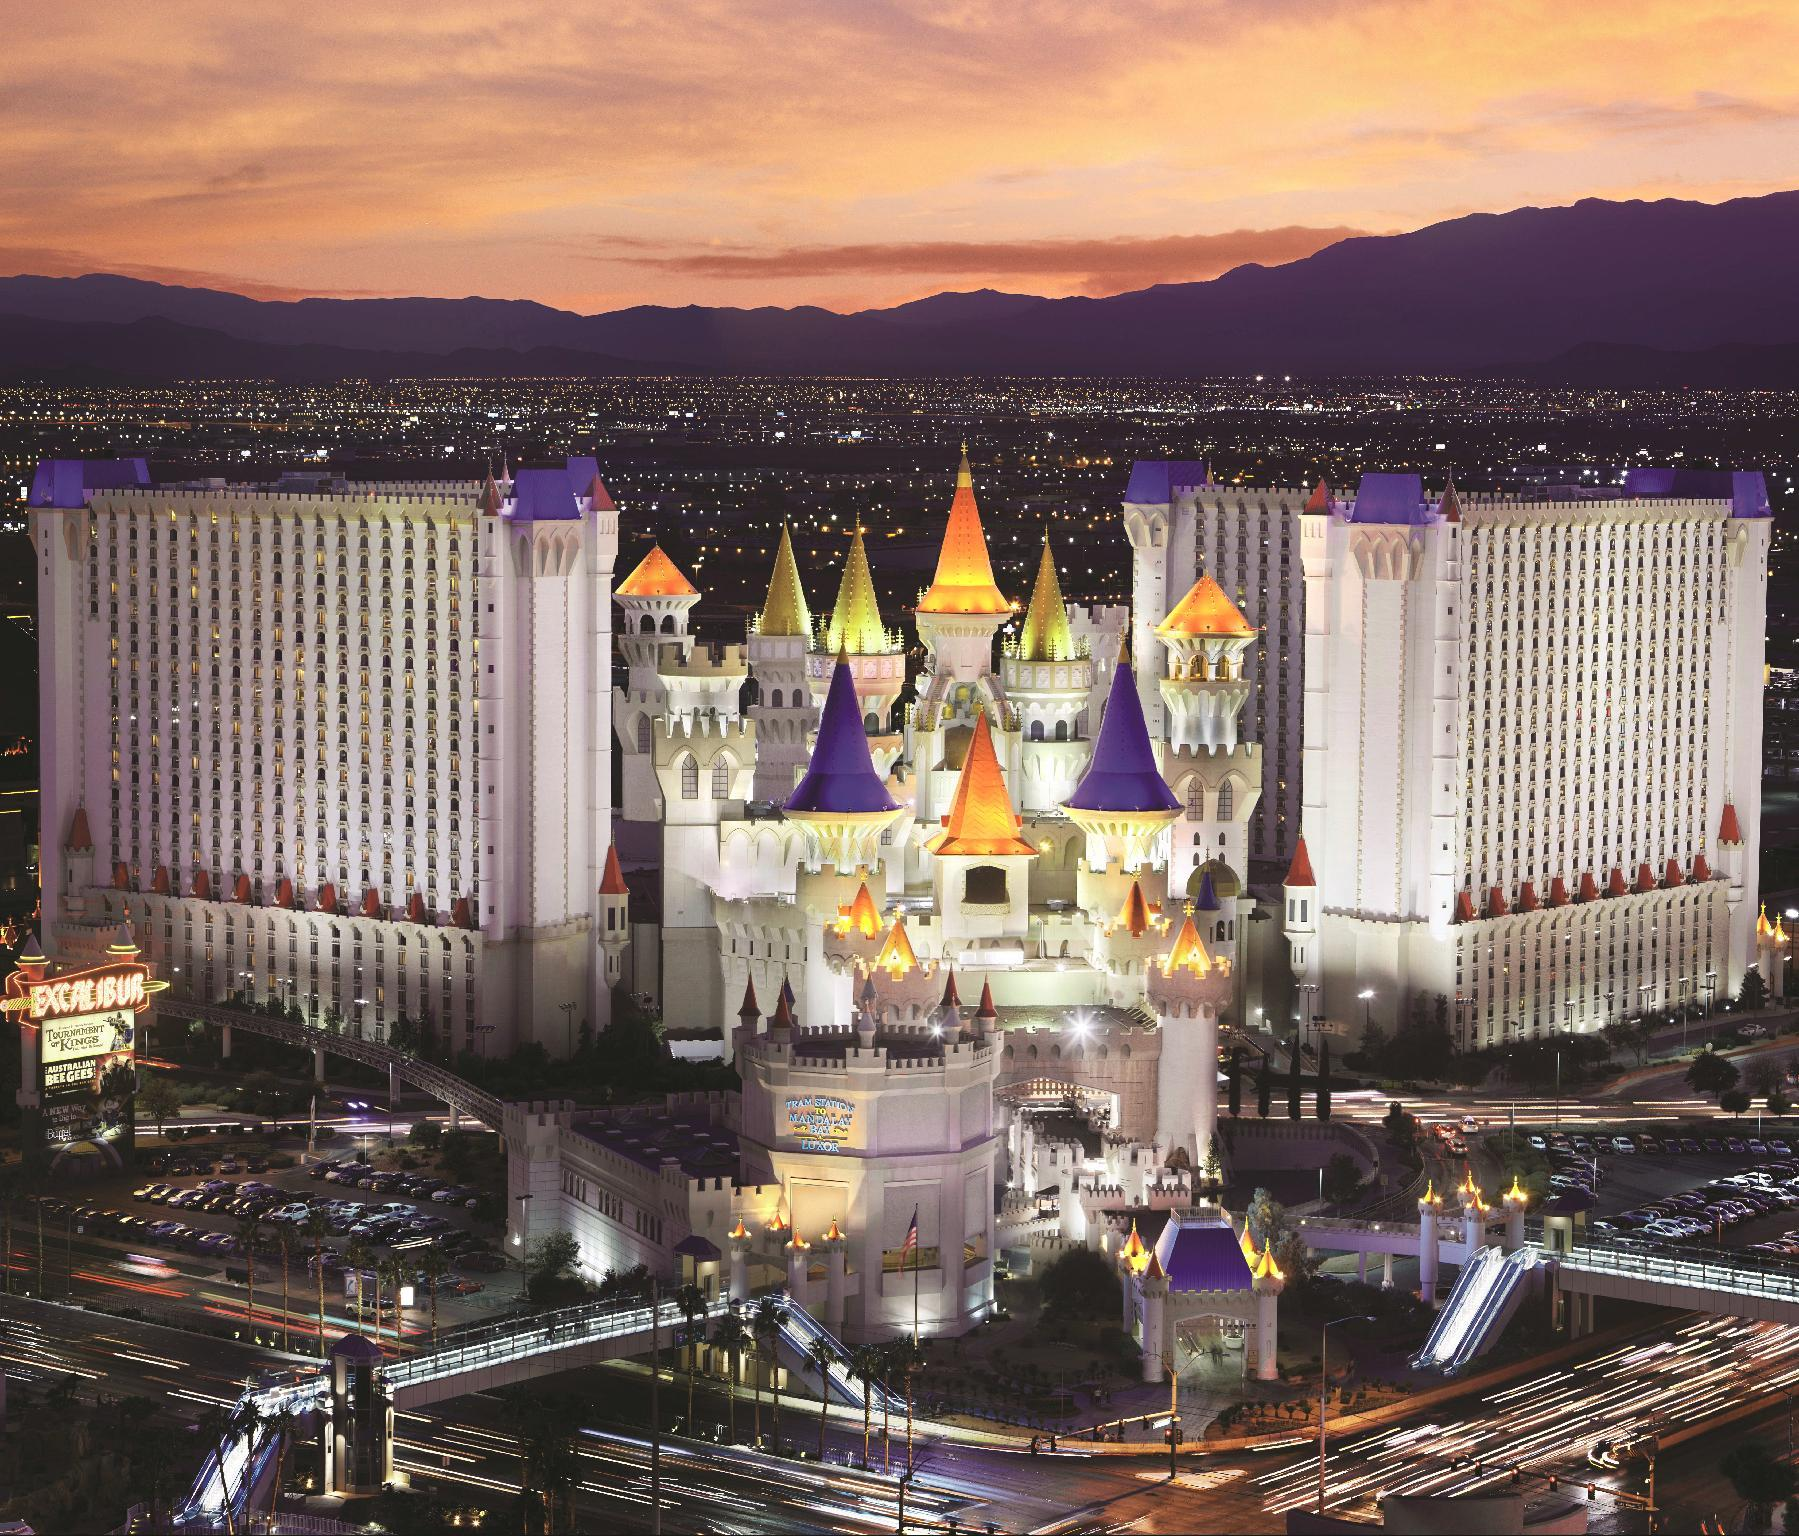 Best Price on Excalibur Hotel in Las Vegas NV Reviews